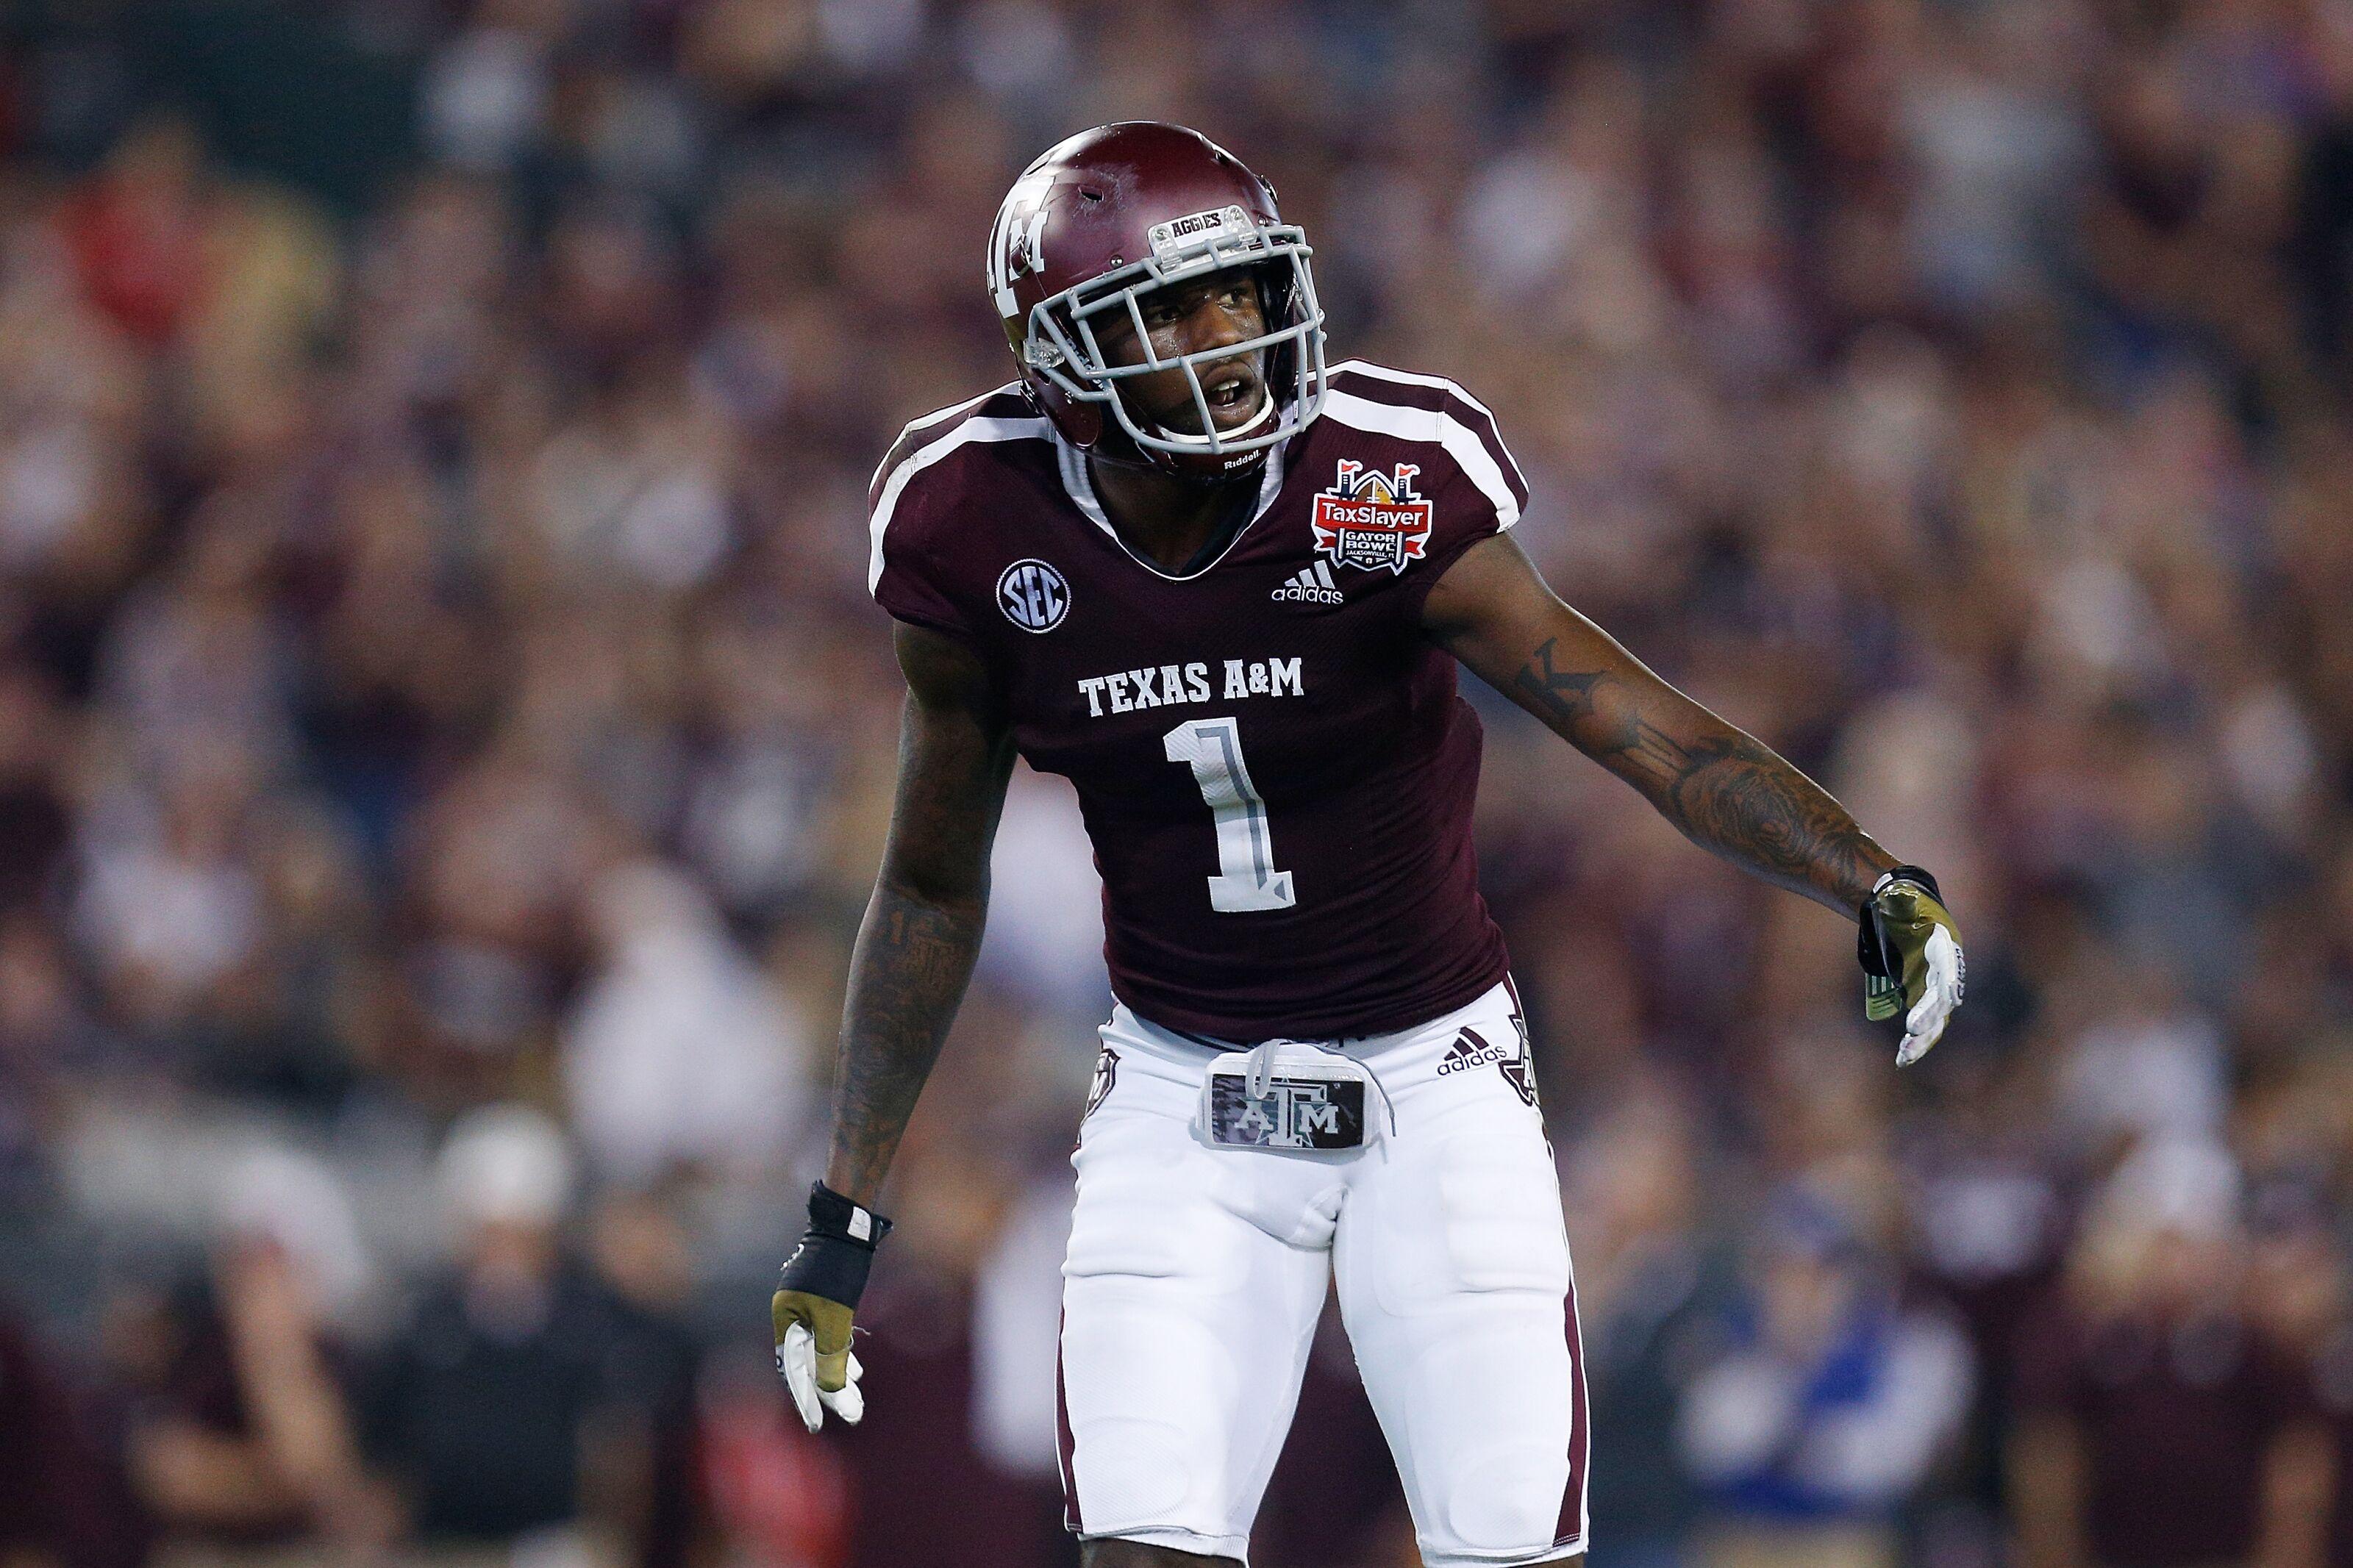 Texas A&M Football: Quartney Davis to play on Saturday